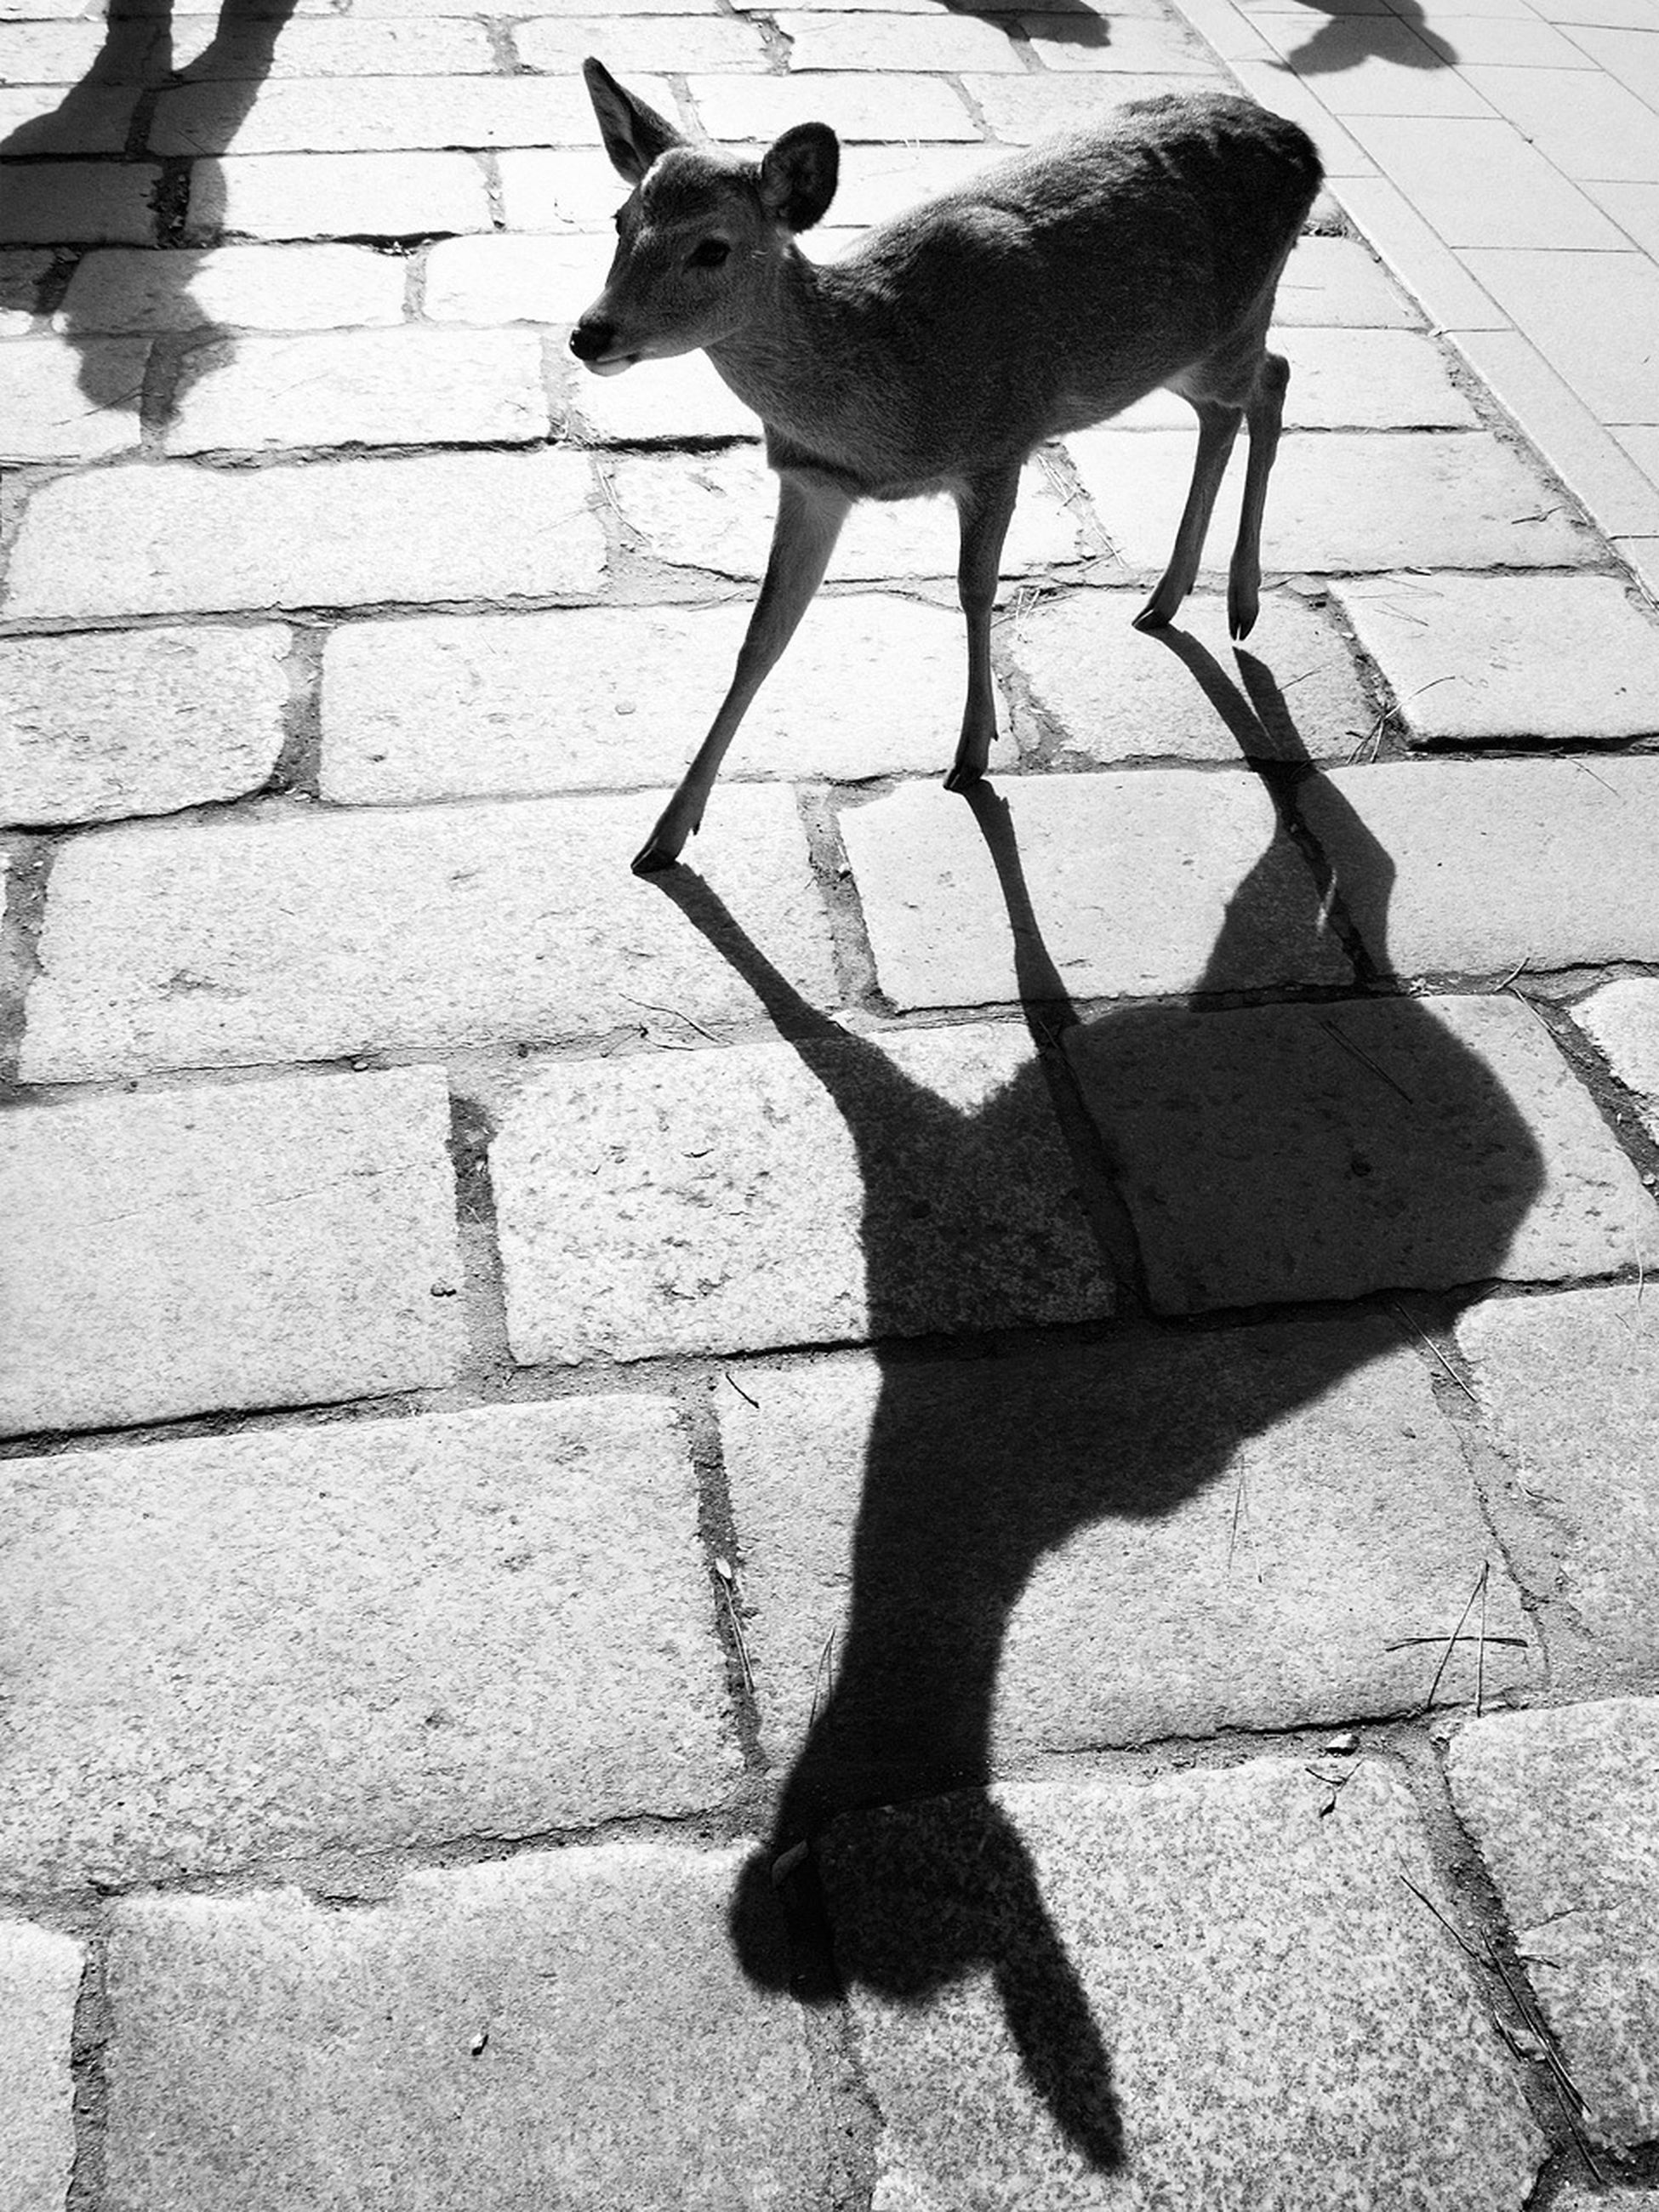 animal themes, one animal, domestic animals, pets, mammal, shadow, high angle view, sunlight, dog, cobblestone, street, standing, domestic cat, wildlife, footpath, animals in the wild, paving stone, walking, full length, sidewalk